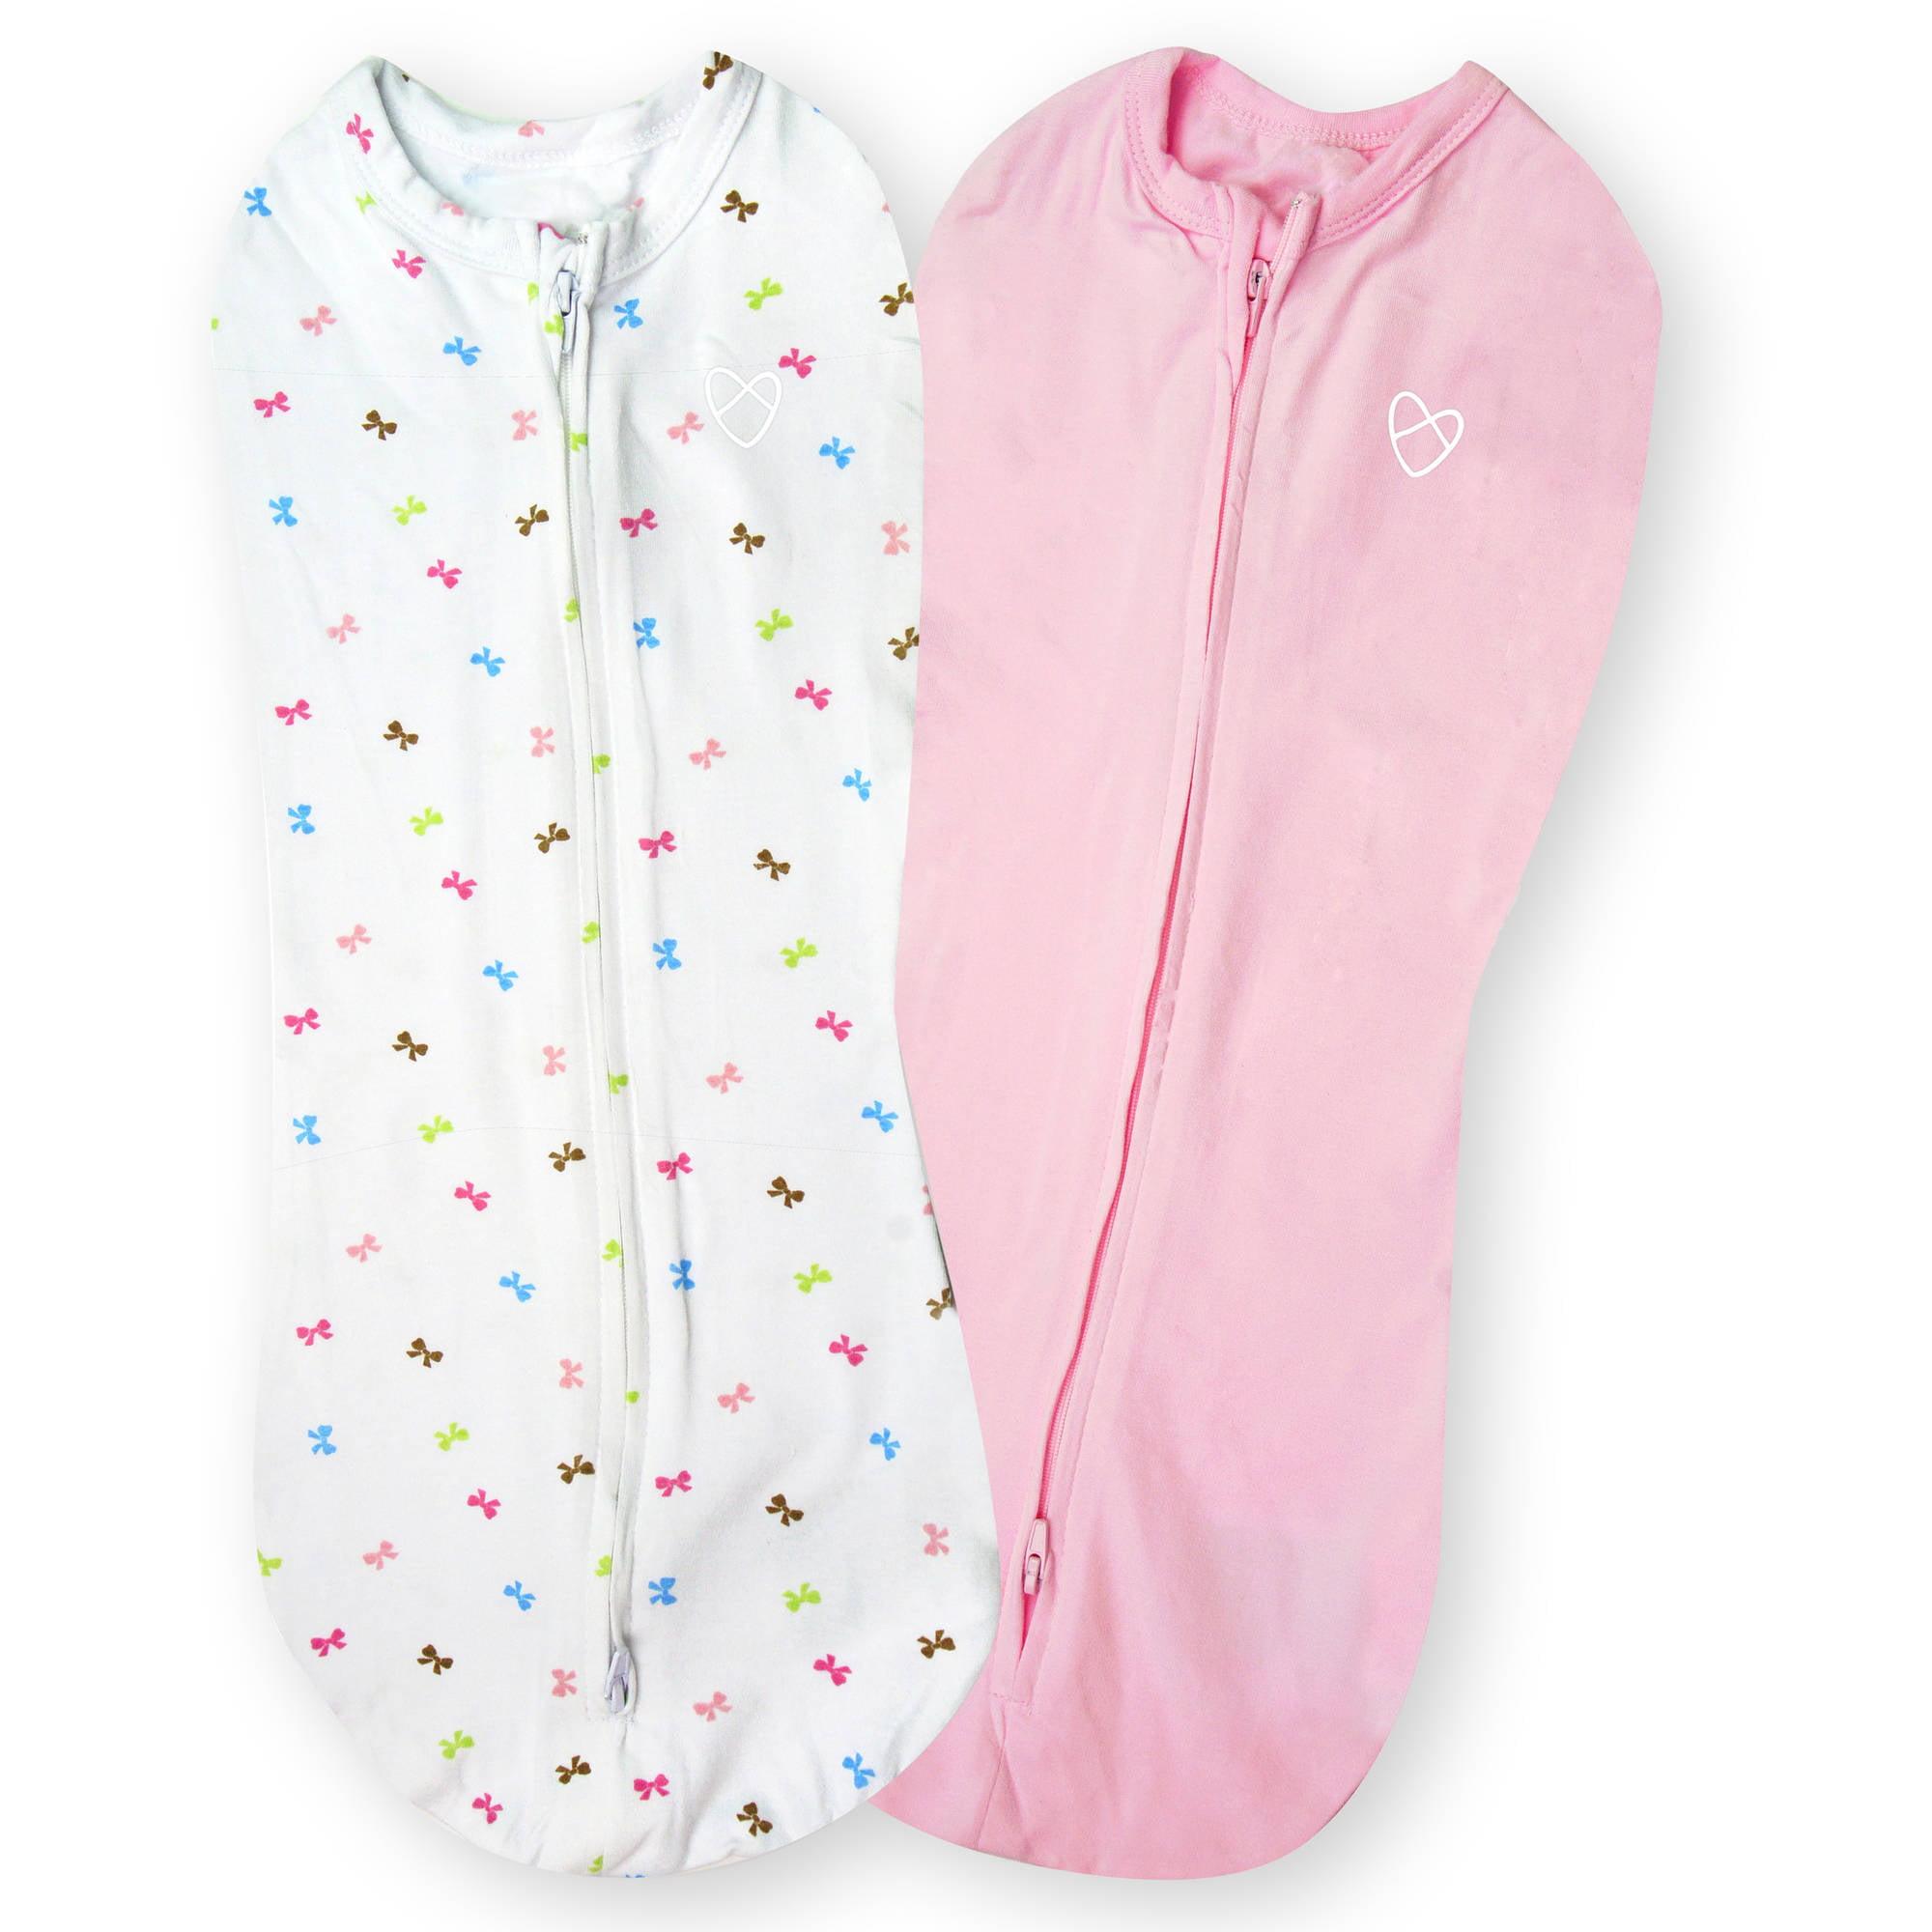 Summer Infant Baby Wrap Swaddle Sleeping Bag Large Pink//White Stripe 1Pk